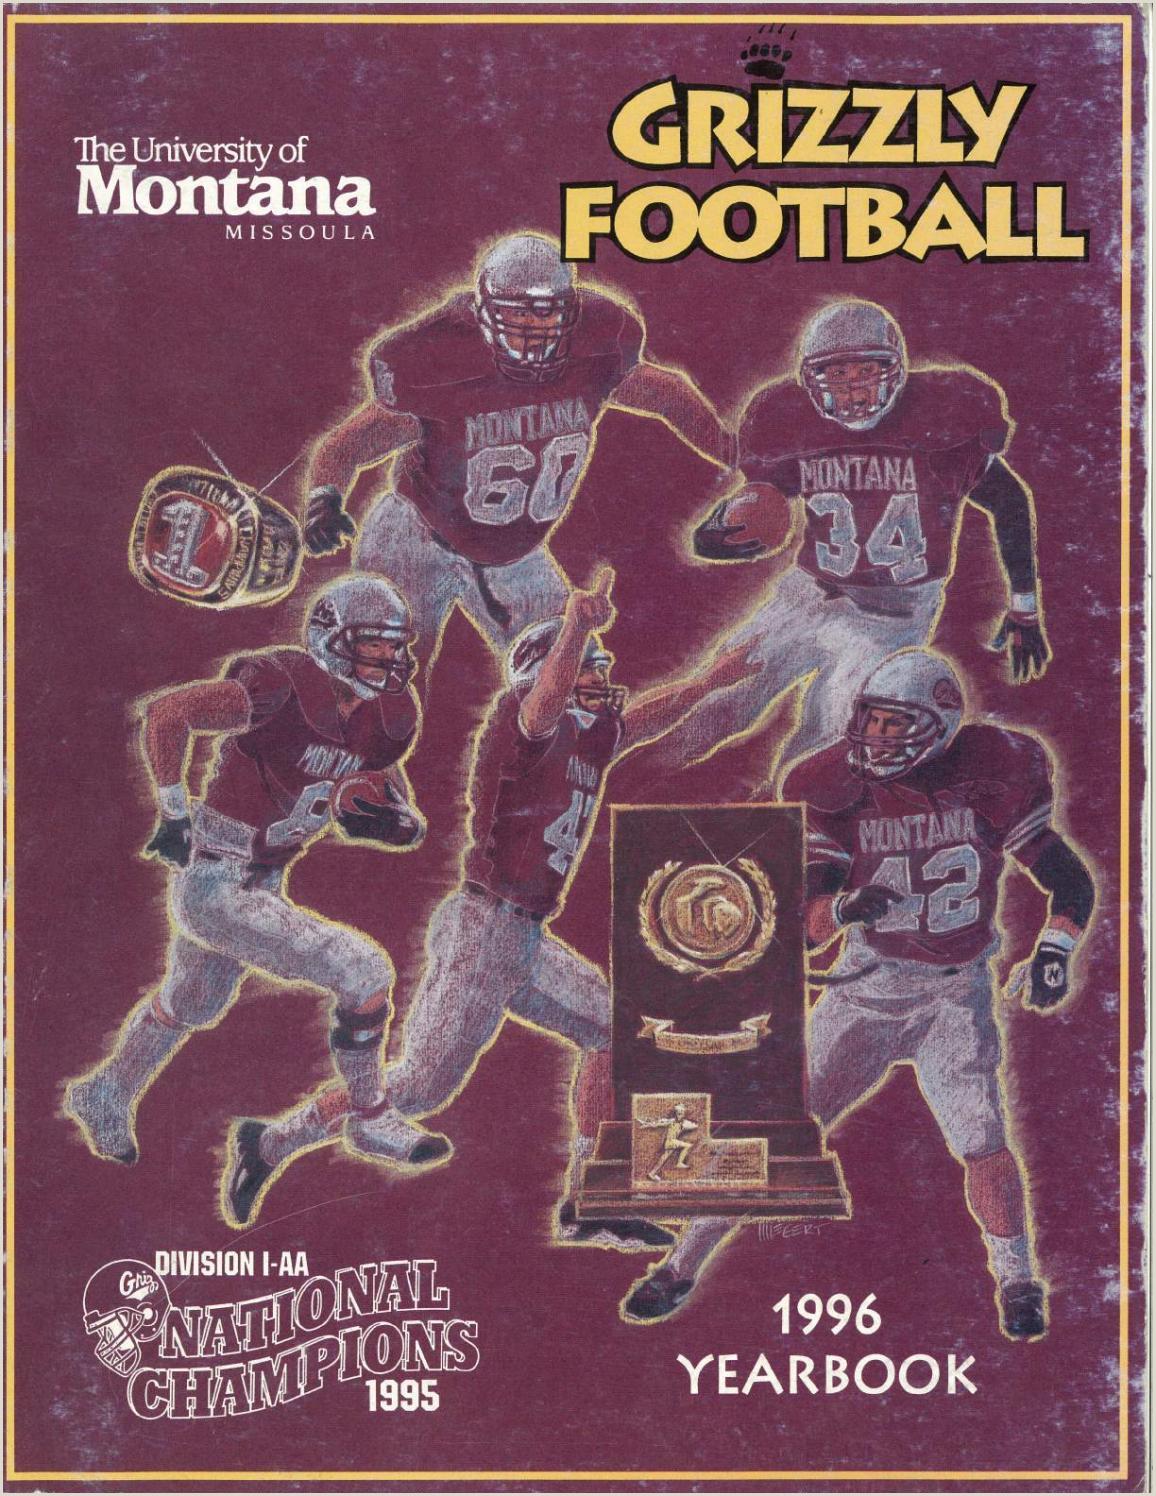 Vista Print Outdoor Banner 1996 Football Media Guide By University Of Montana Athletics